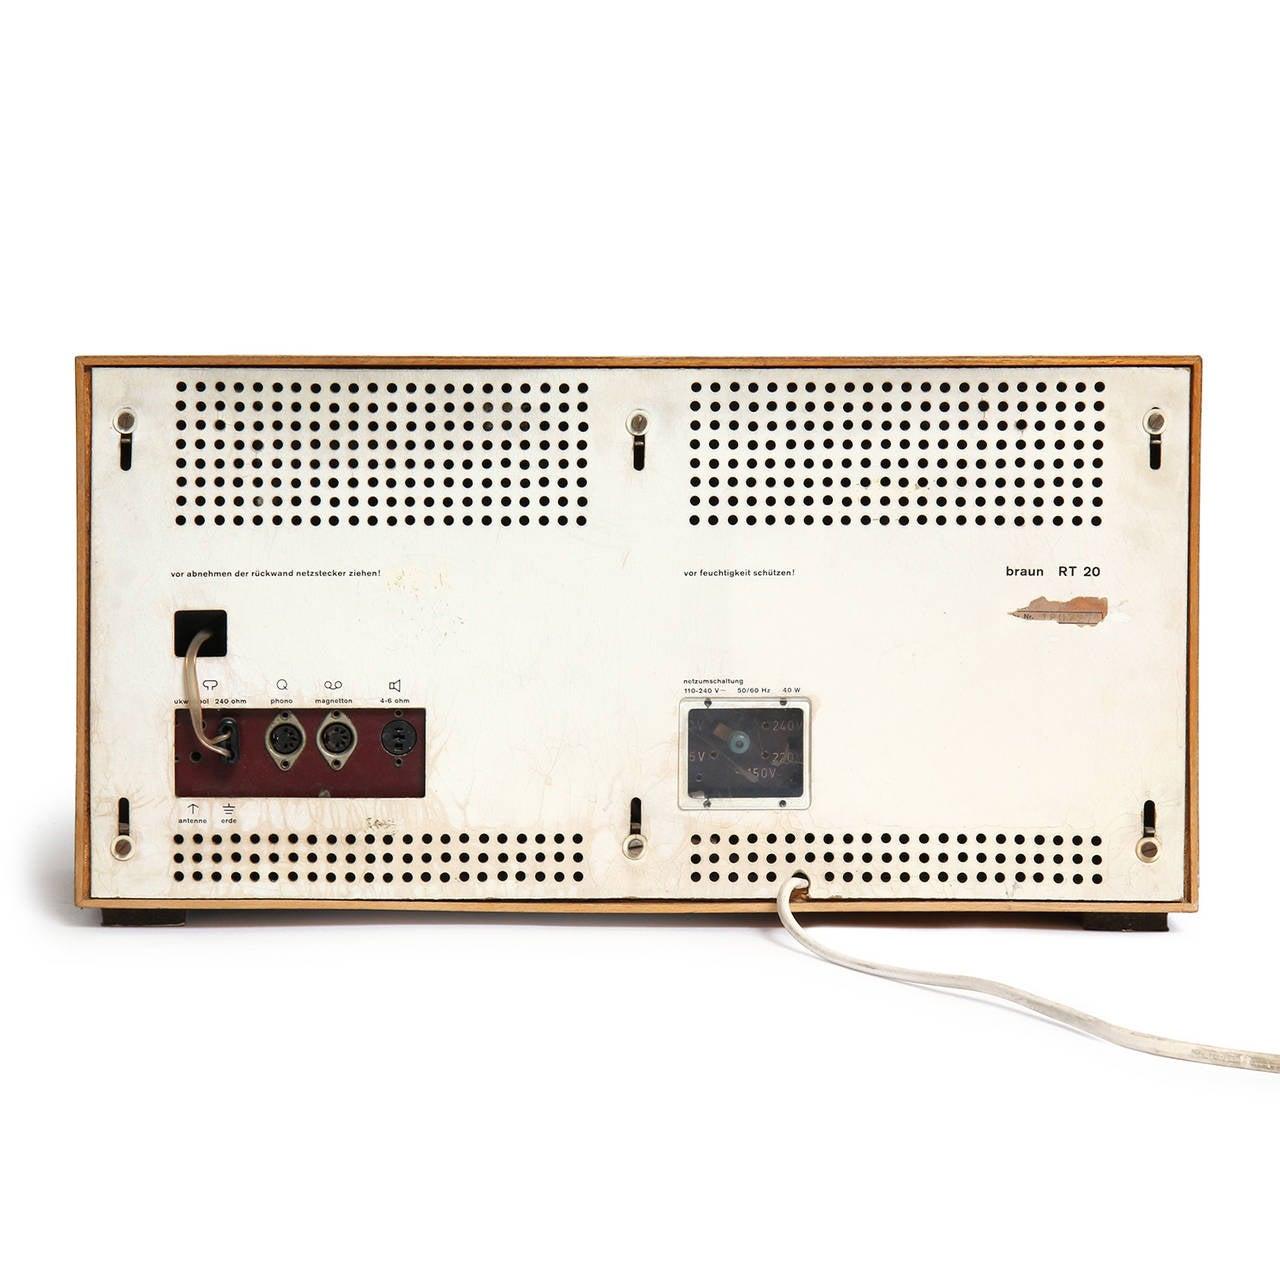 Beech Desk Radio by Dieter Rams